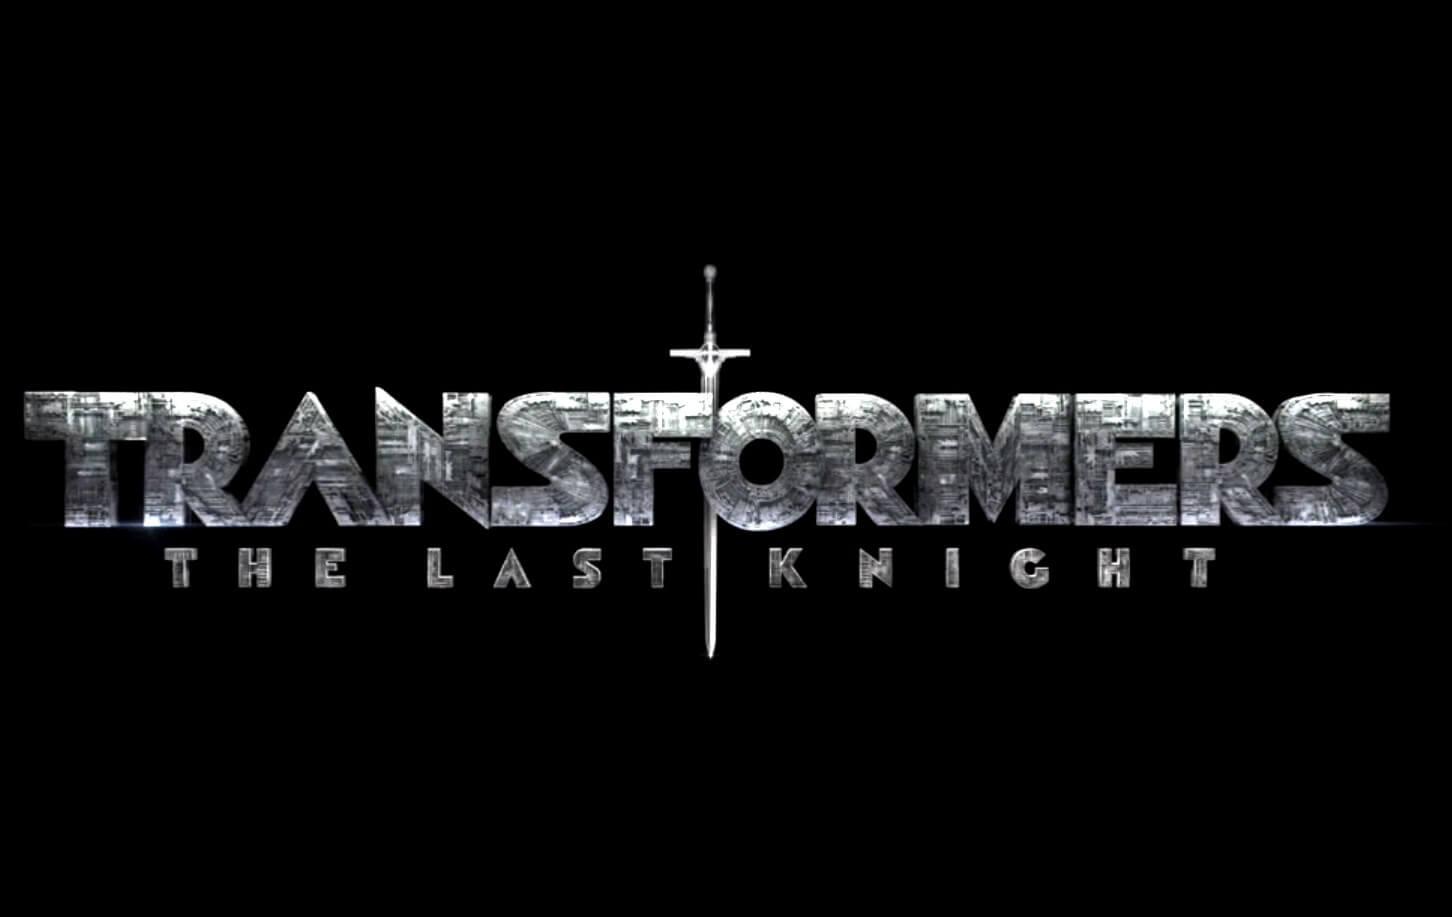 Yeni Transformers filmi açıklandı: Transformers: The Last Knight! 1